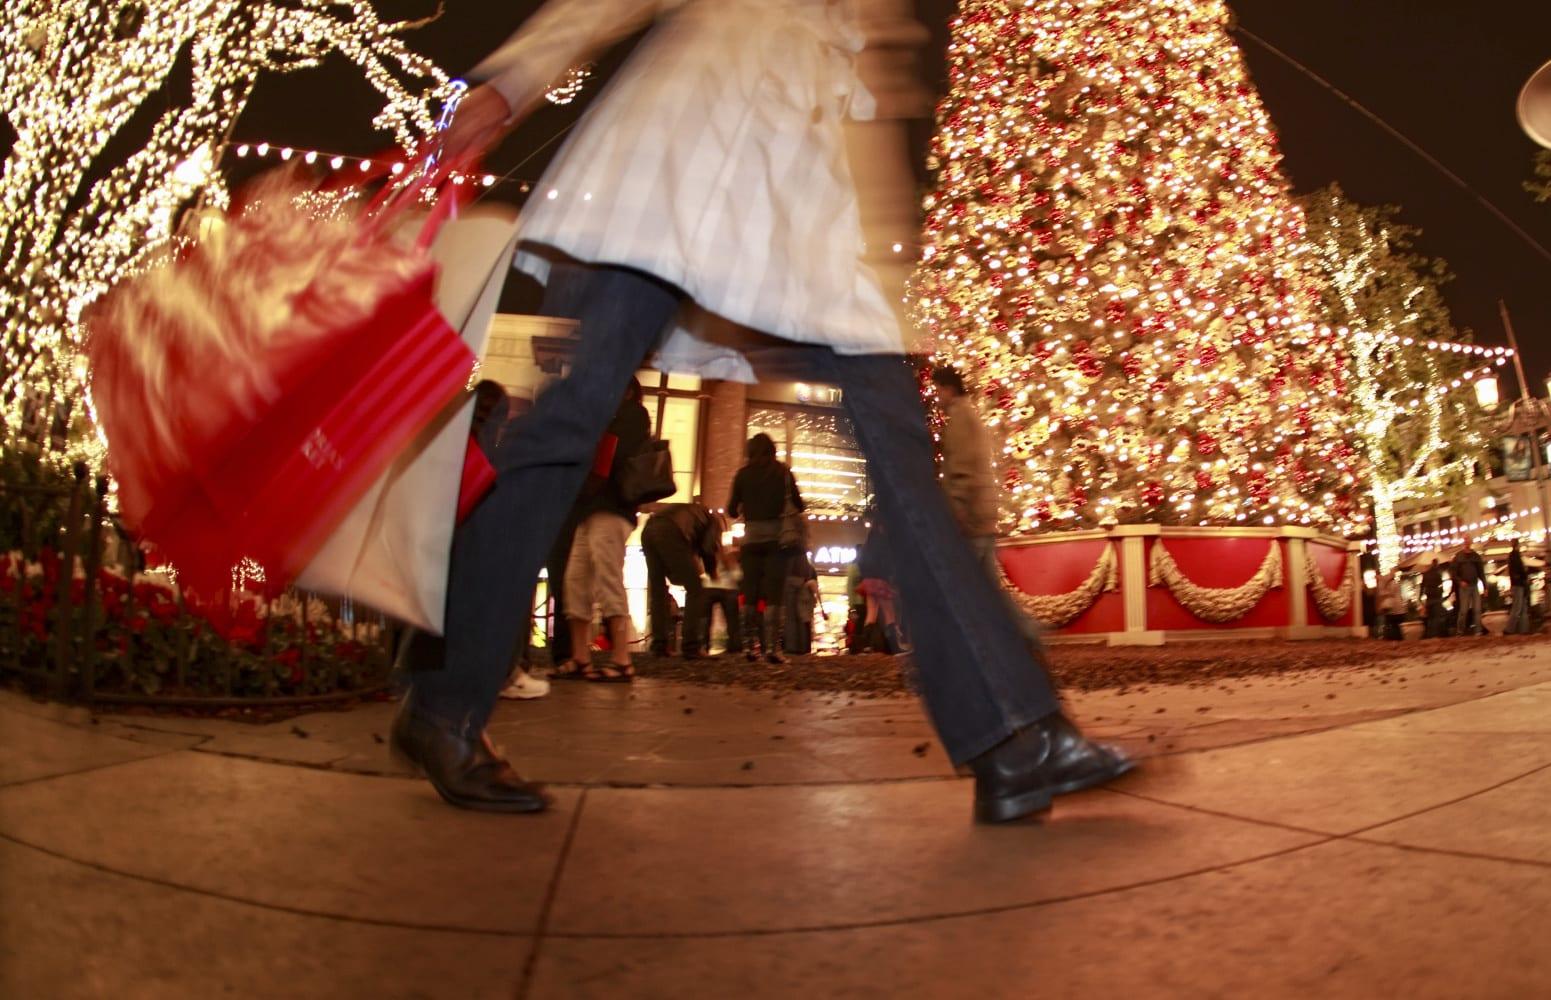 AEGON - Gastos Navidad